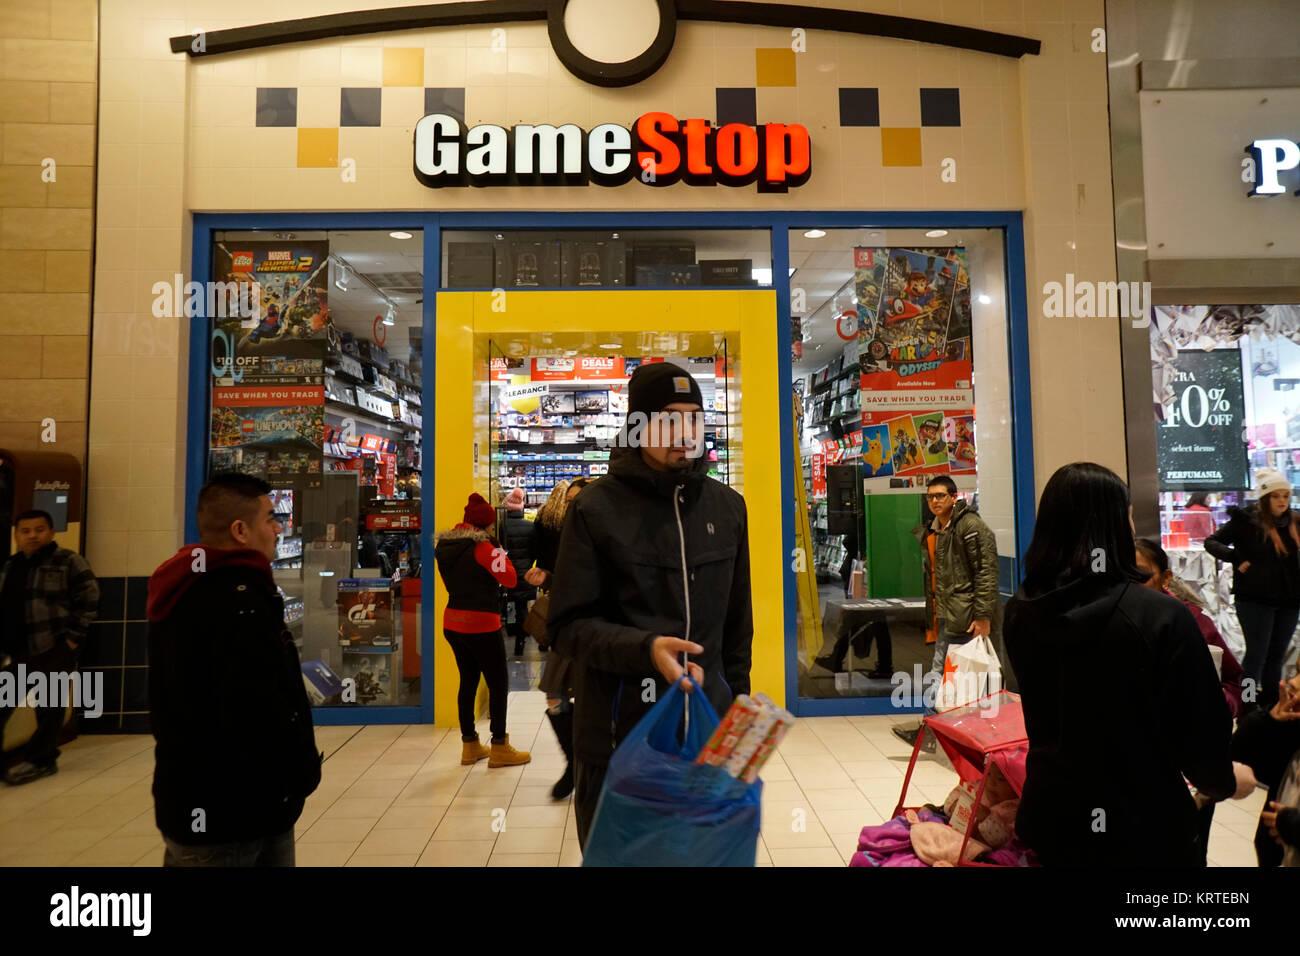 Gamestop Store Stock Photos & Gamestop Store Stock Images